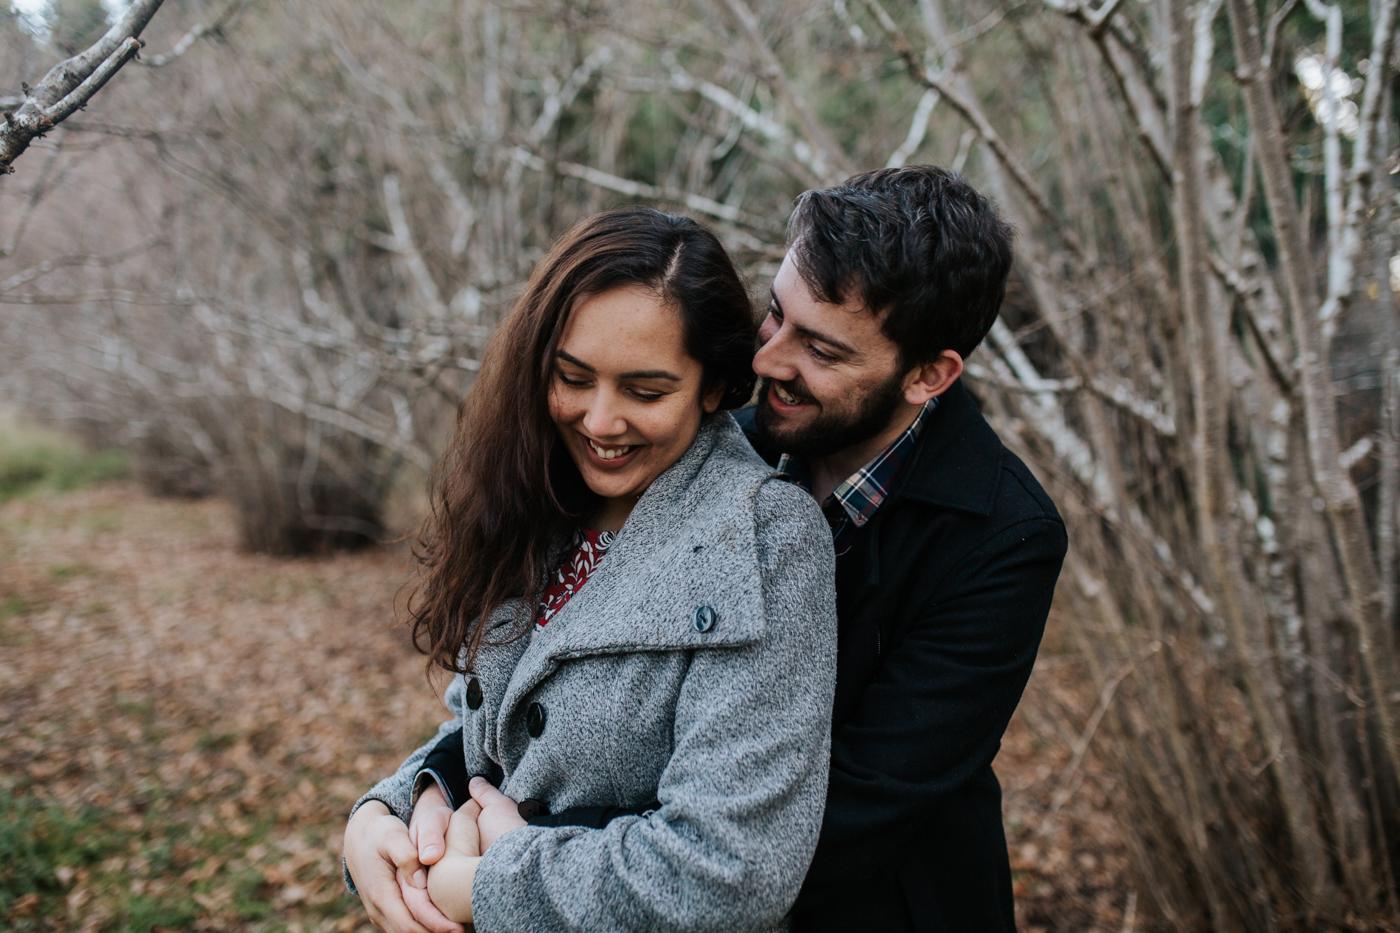 Kate & Kieran - Southern Highlands Engagement - Samantha Heather Photography-32.jpg